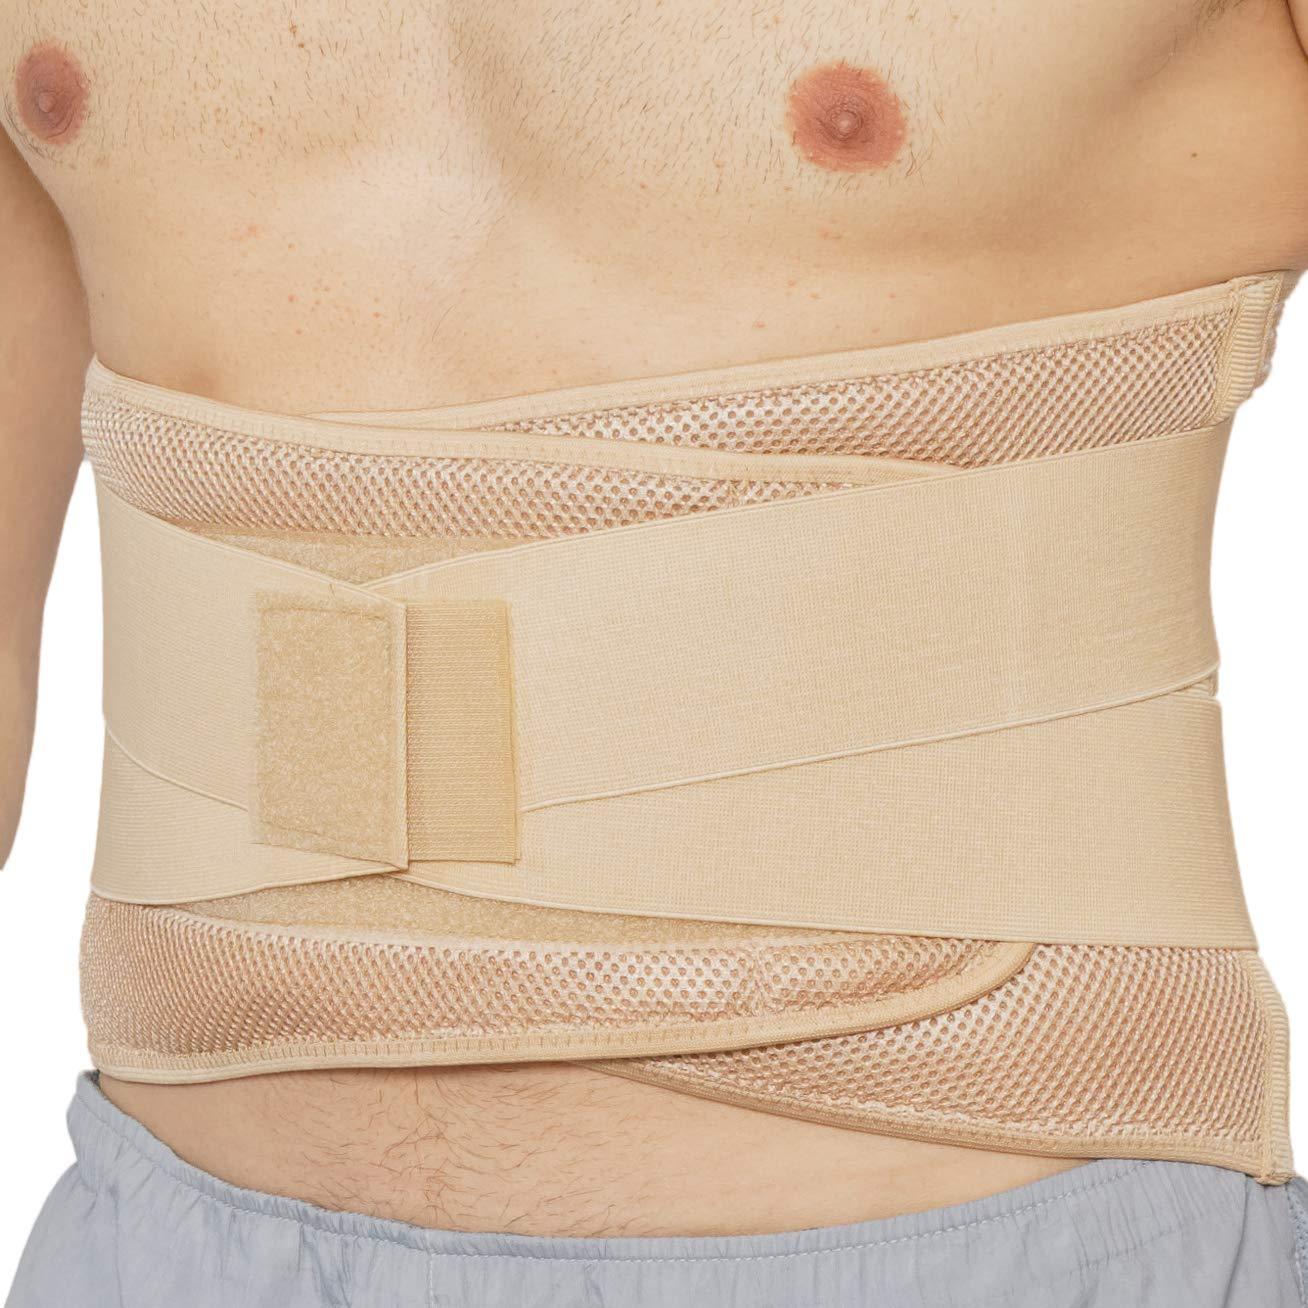 Apoyo lumbar con fuertes tirantes de doble banda, Faja para la Cintura / Espalda / Zona lumbar - Marca Neotech Care - Color Beige - Talla XL